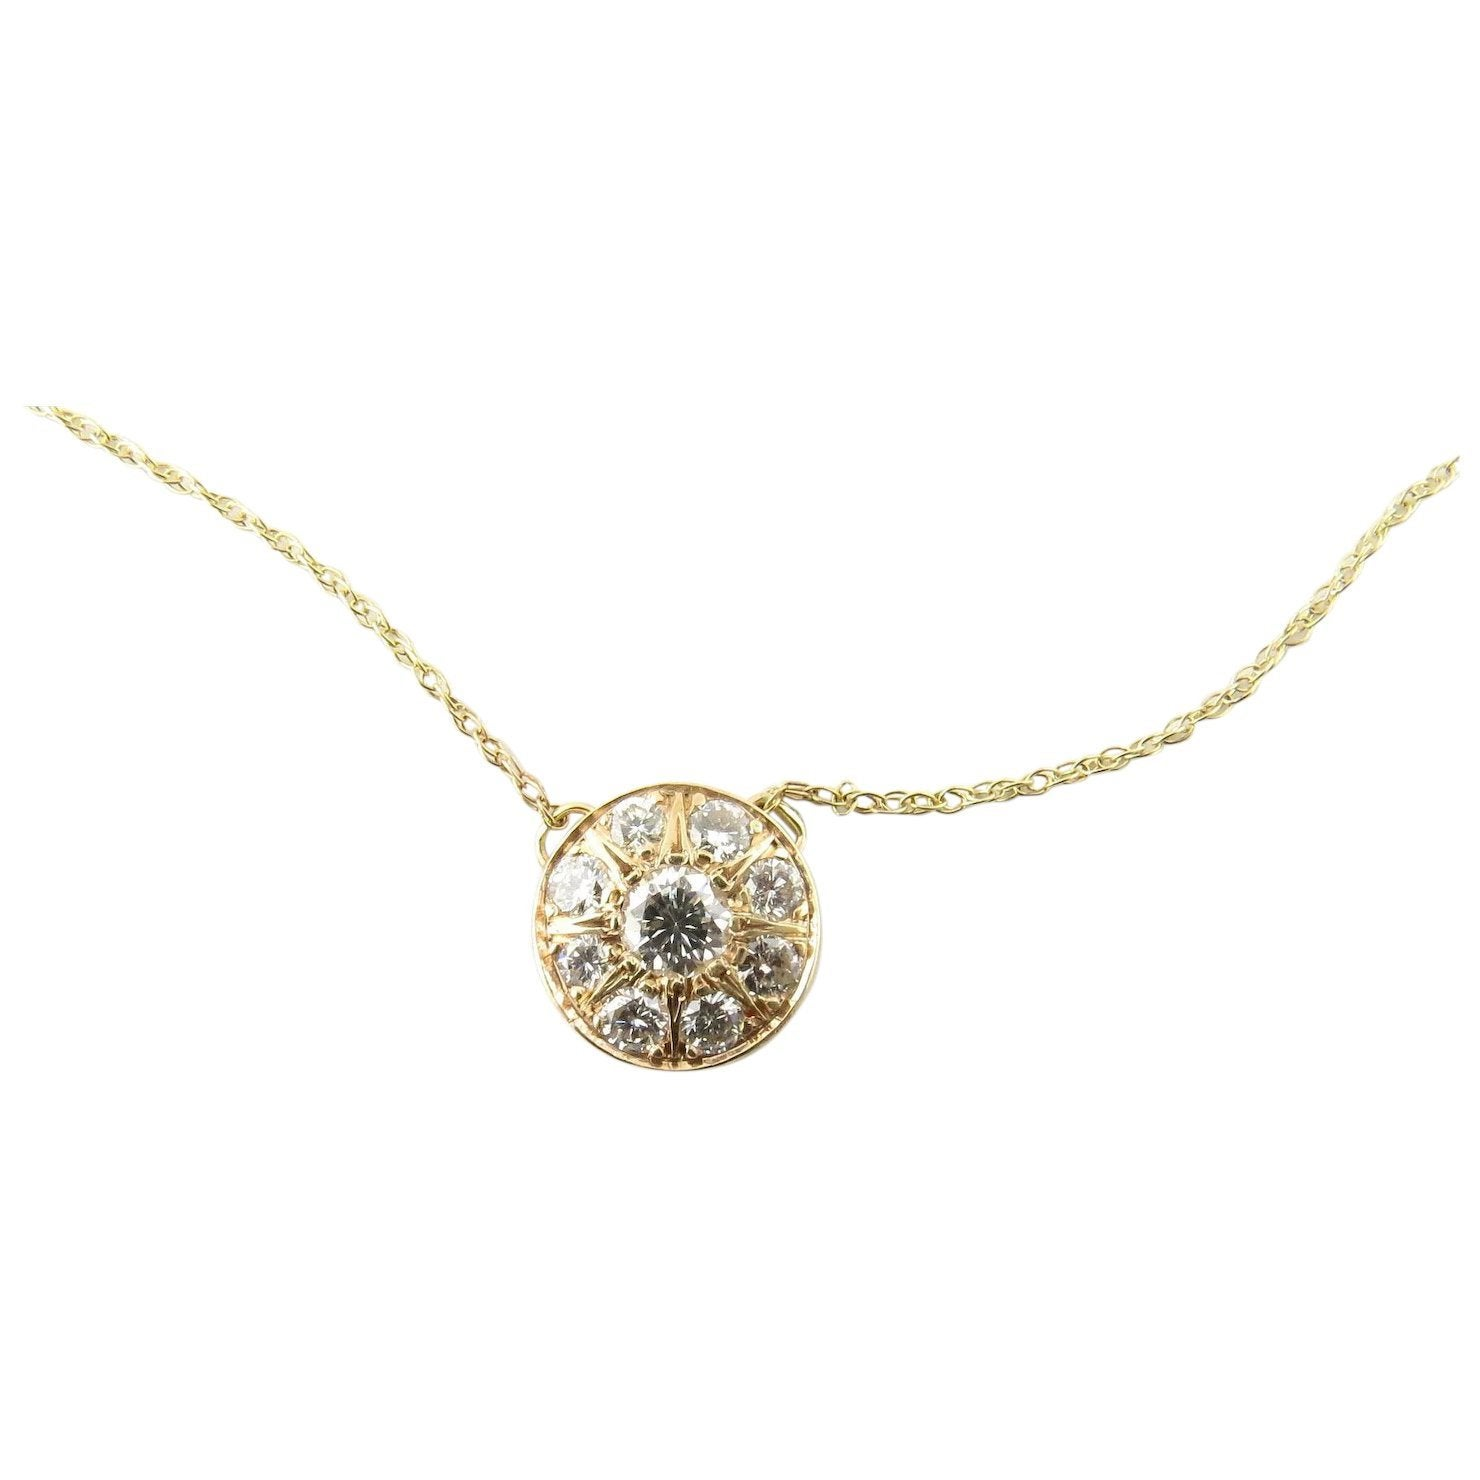 14 Karat Yellow Gold Diamond Pendant Necklace